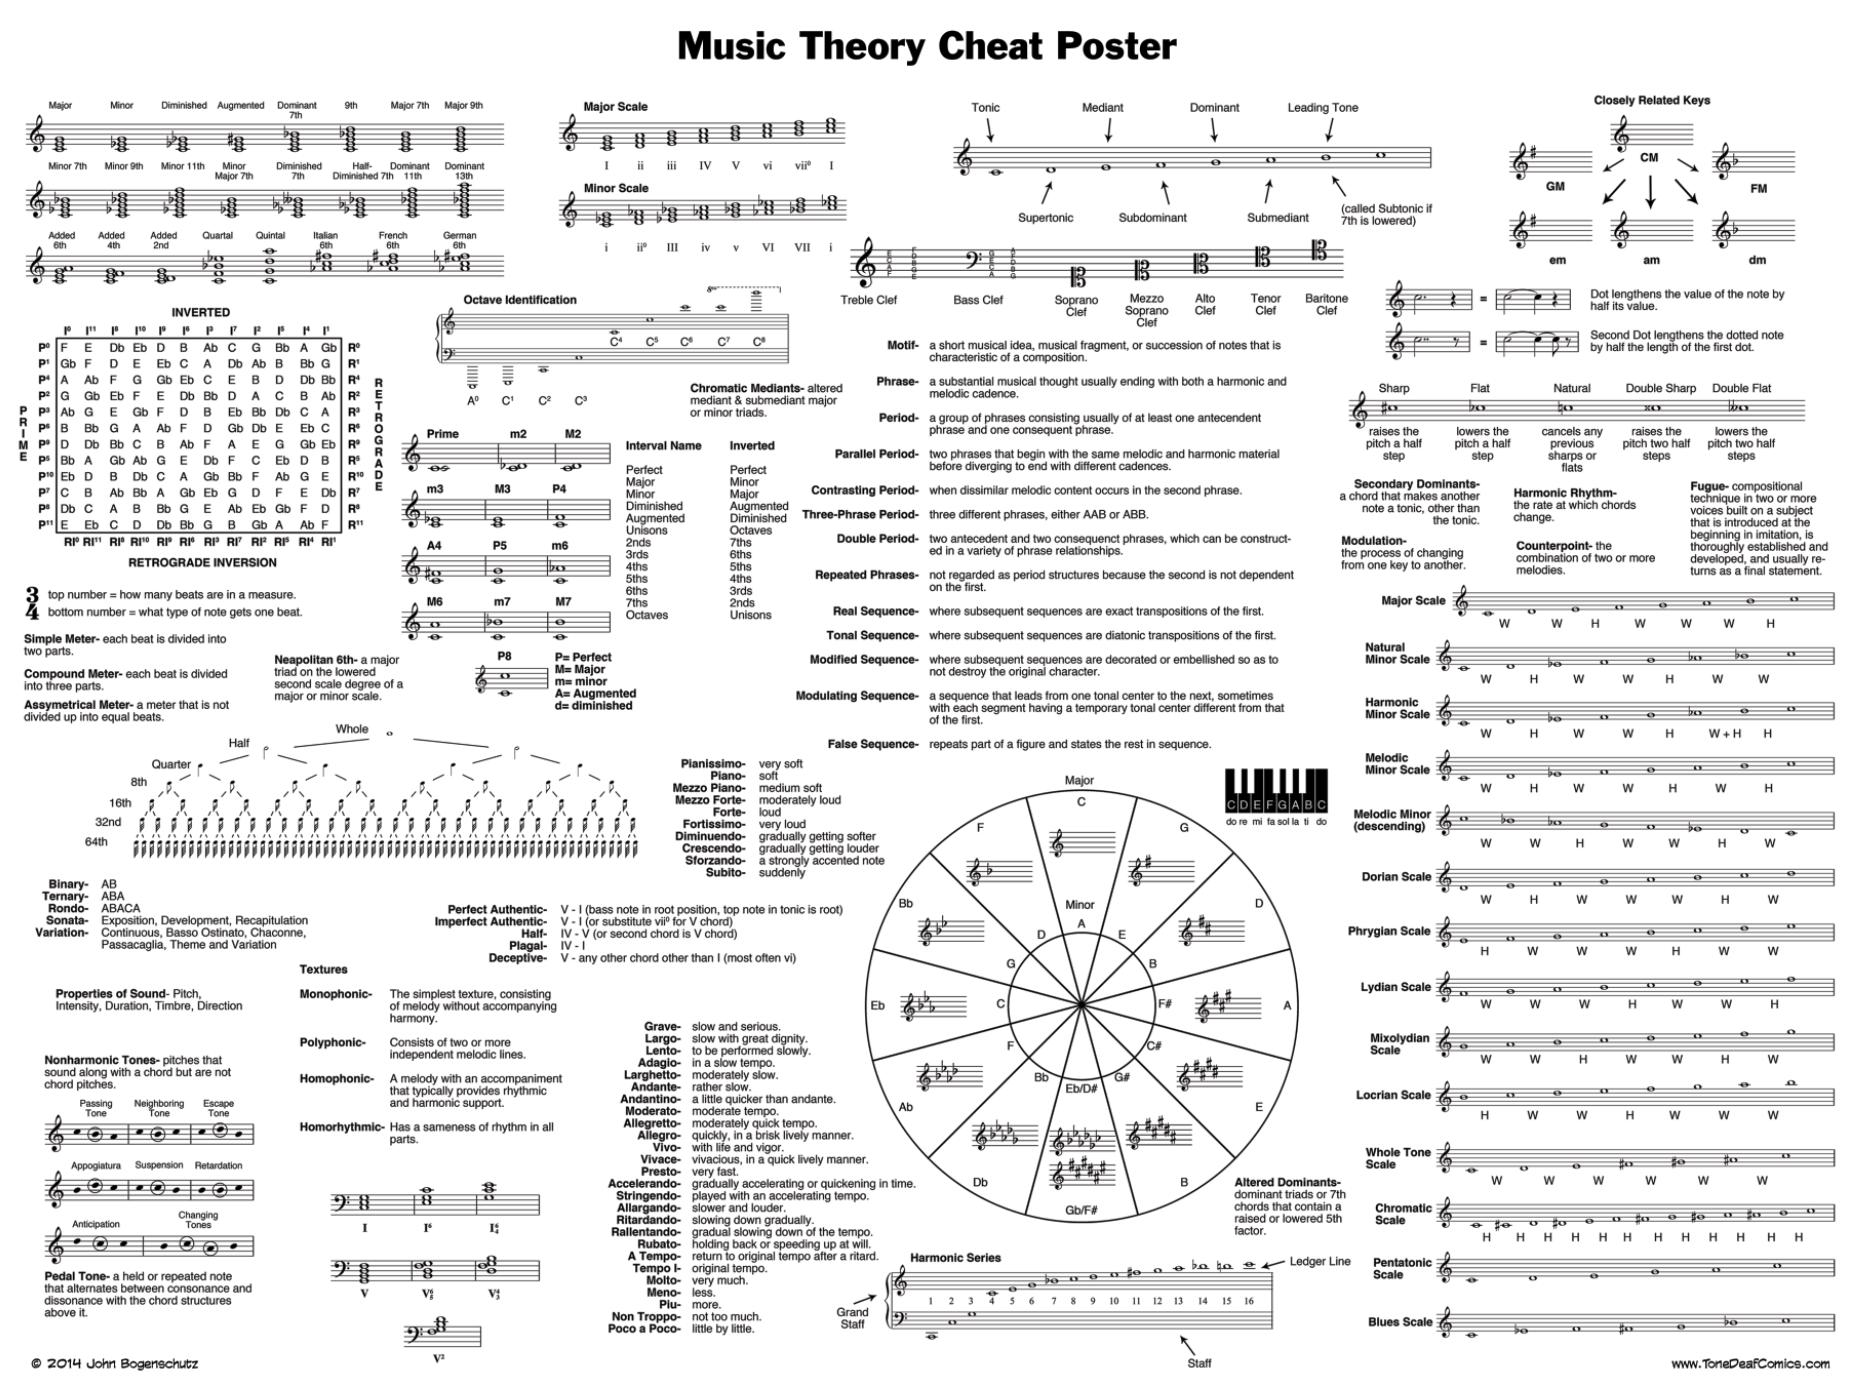 24 X 18 Music Theory Cheat Poster